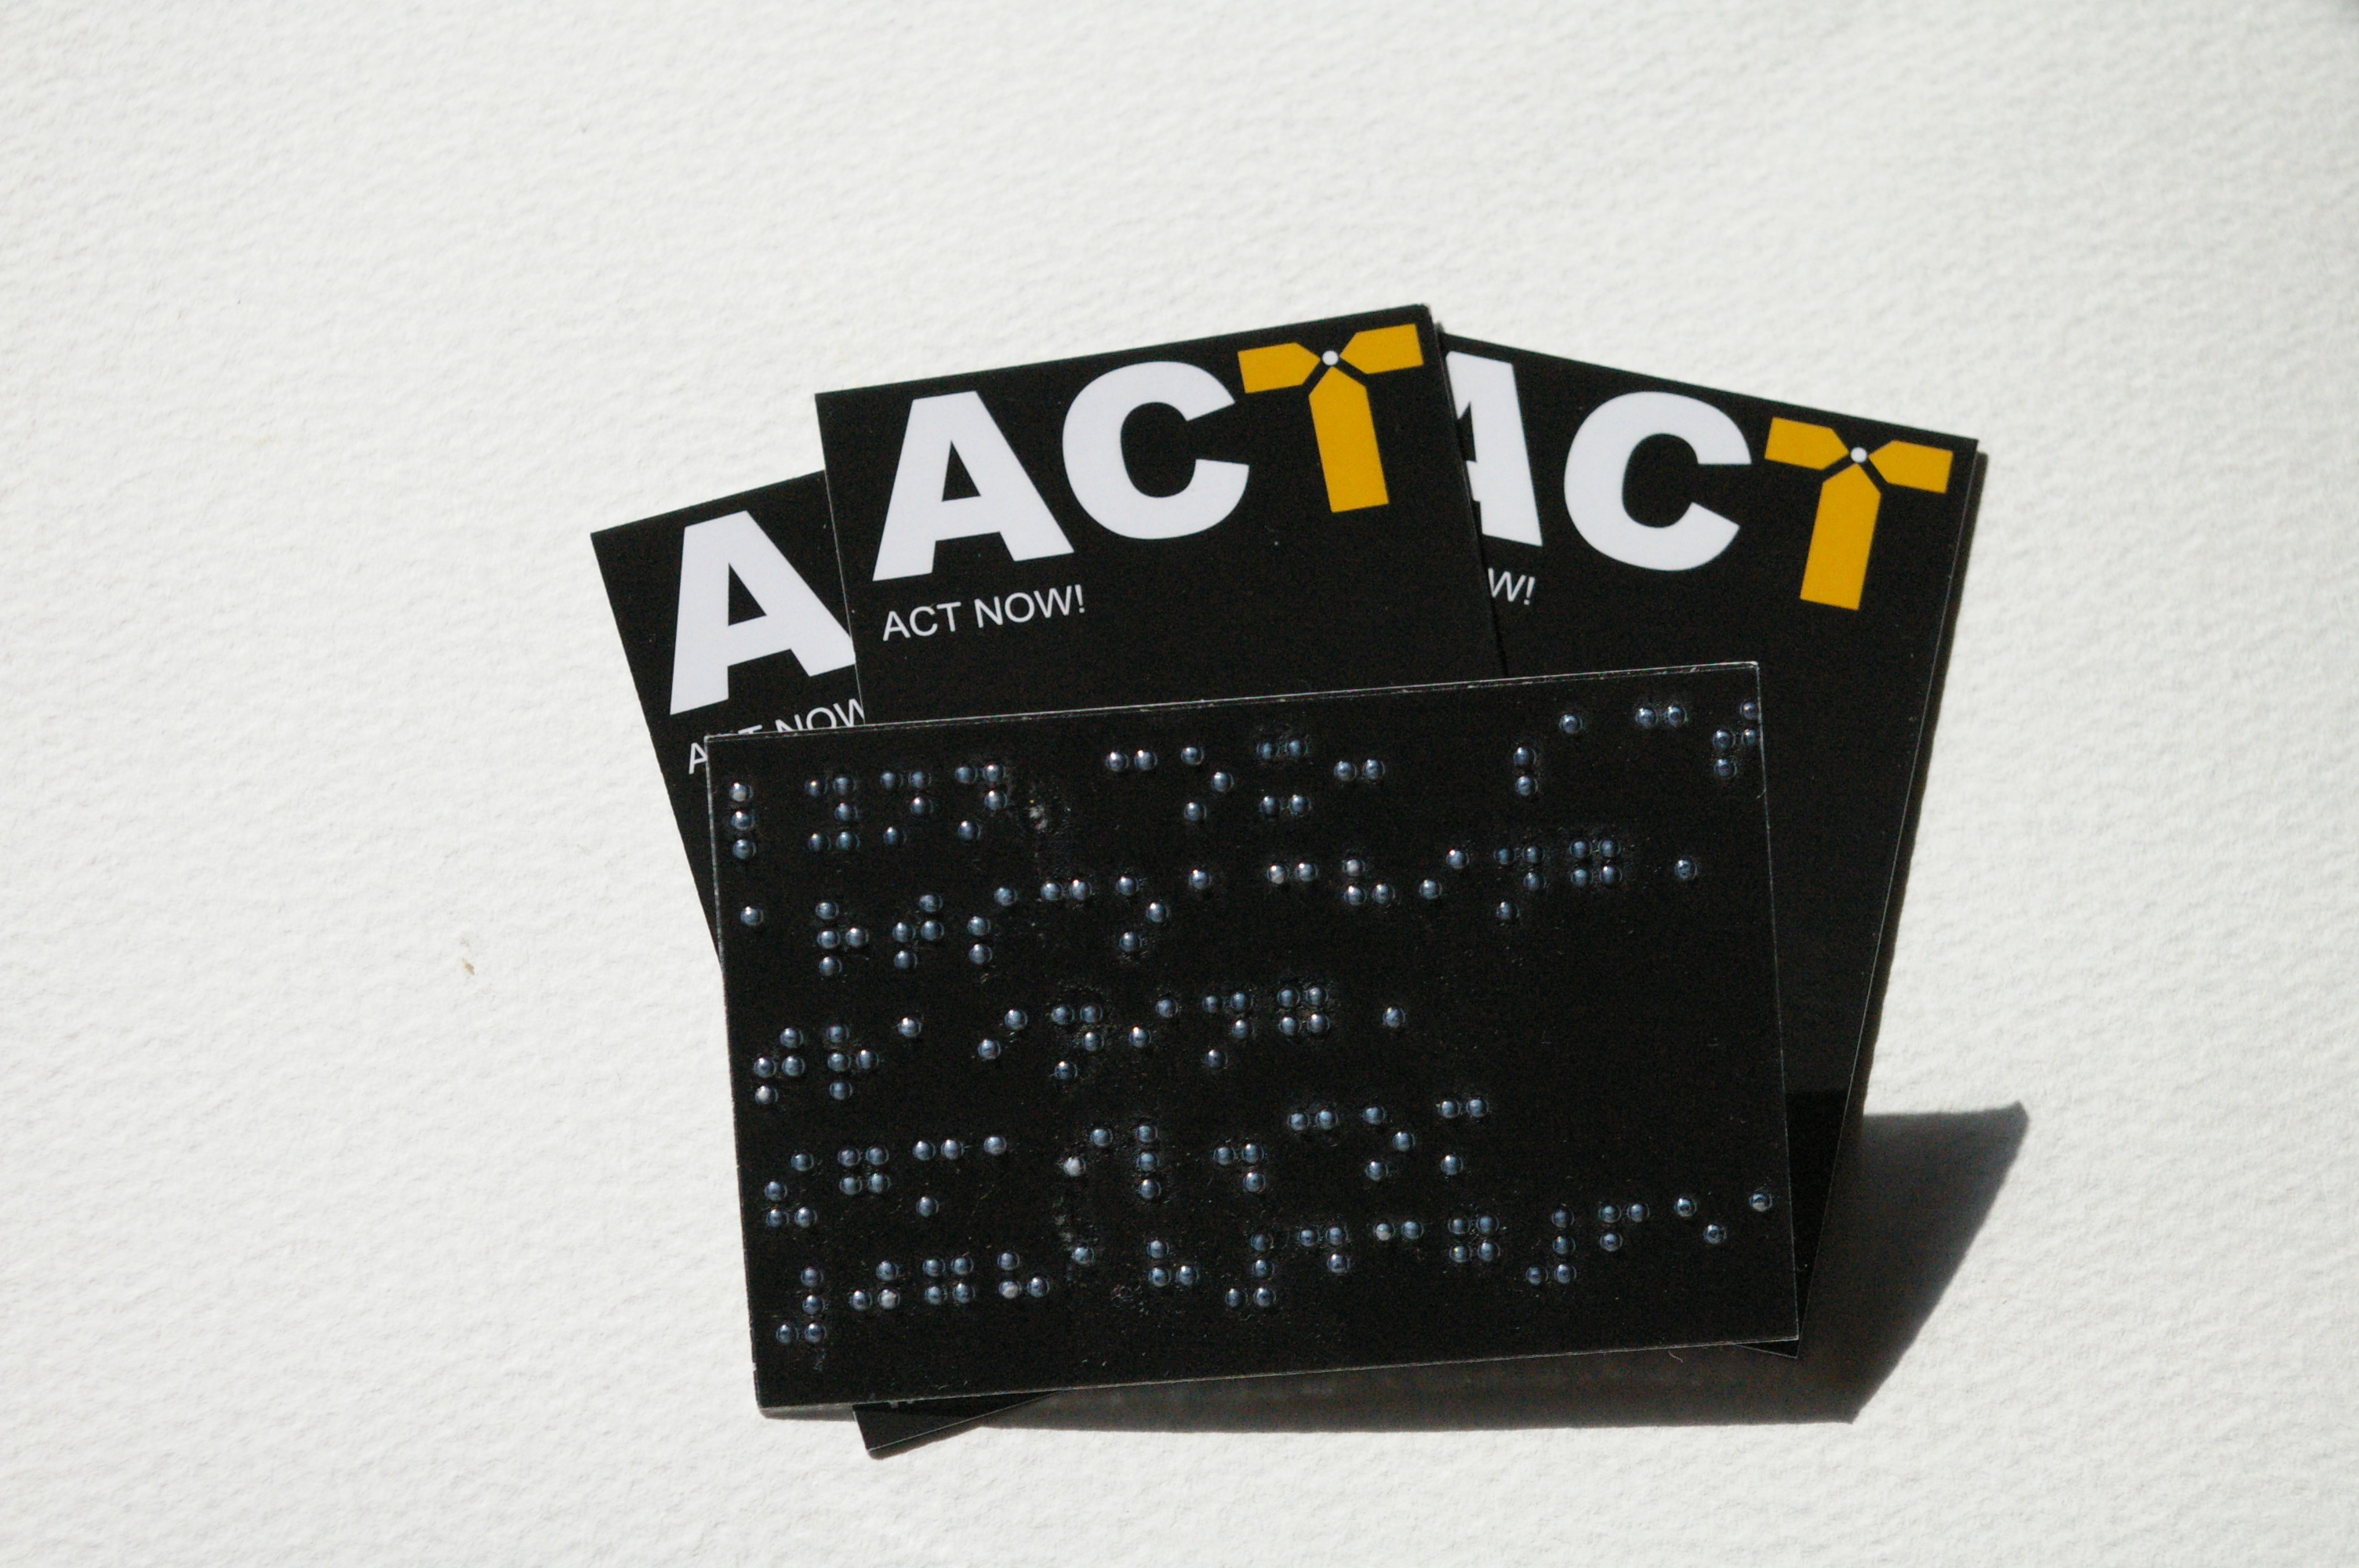 Braille Business Card Service: Send & l\'ll Attach – Arts Coaching ...